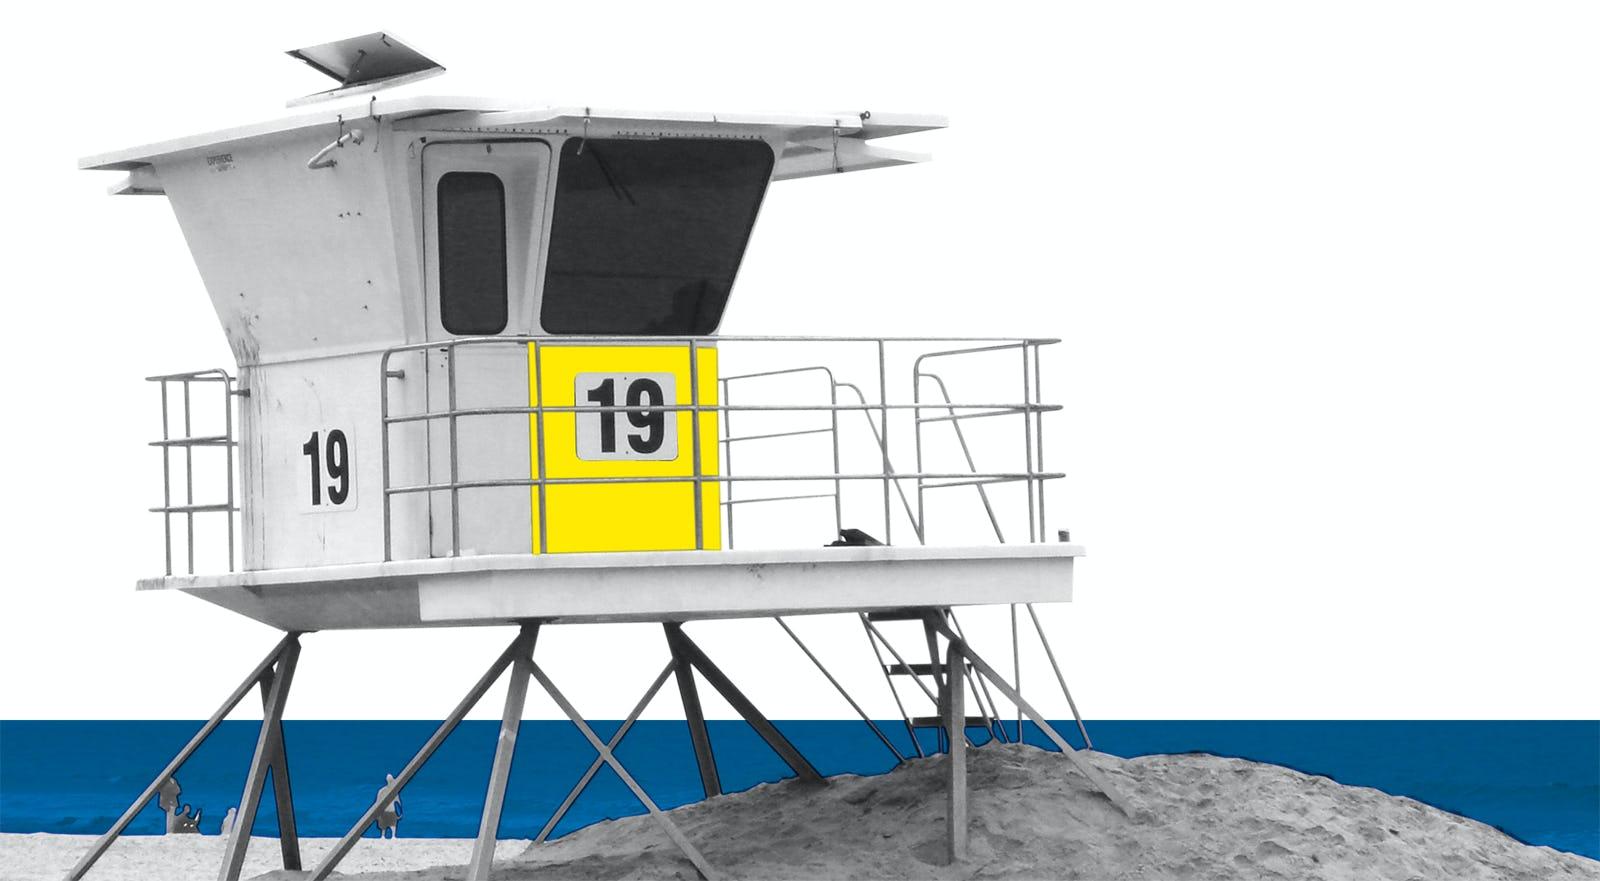 7abfd38c f084 4bce a6b6 9b5aa7ba7baa%2fbryanmaddock qtct lifeguard